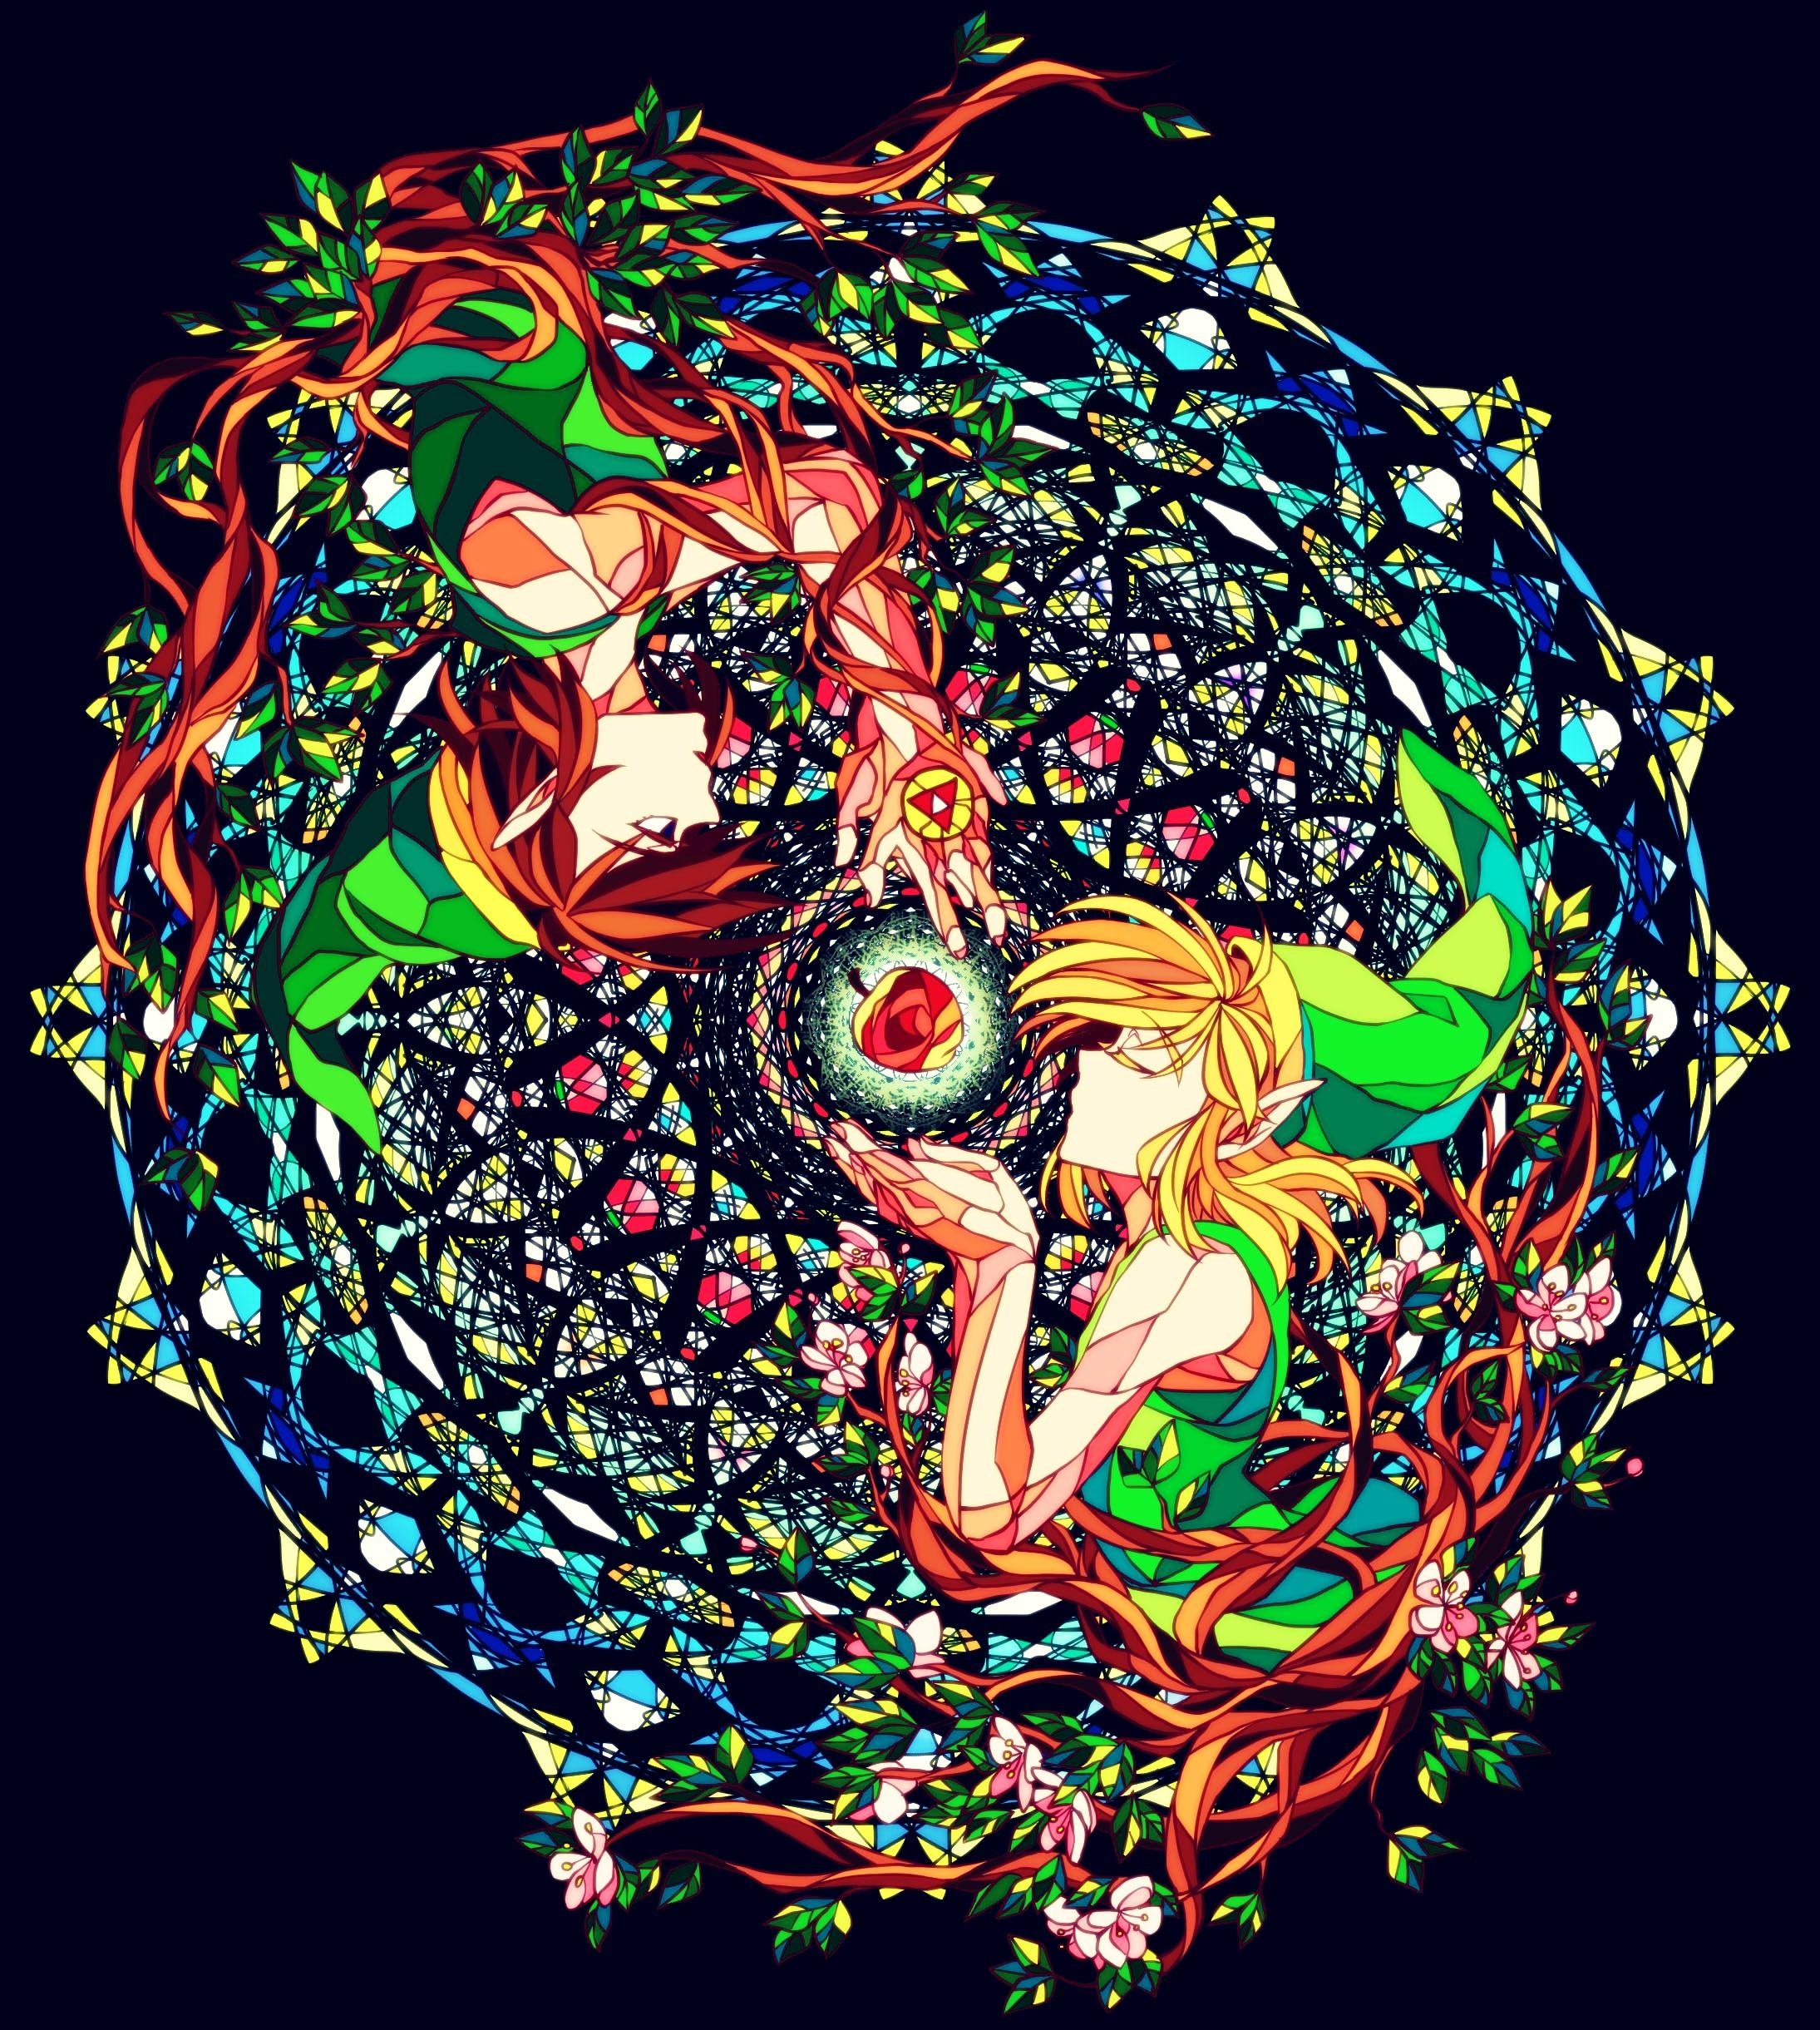 The Legend of Zelda / Link / 「ステンドグラスぽいの」/「秋楽」の漫画 [pixiv]